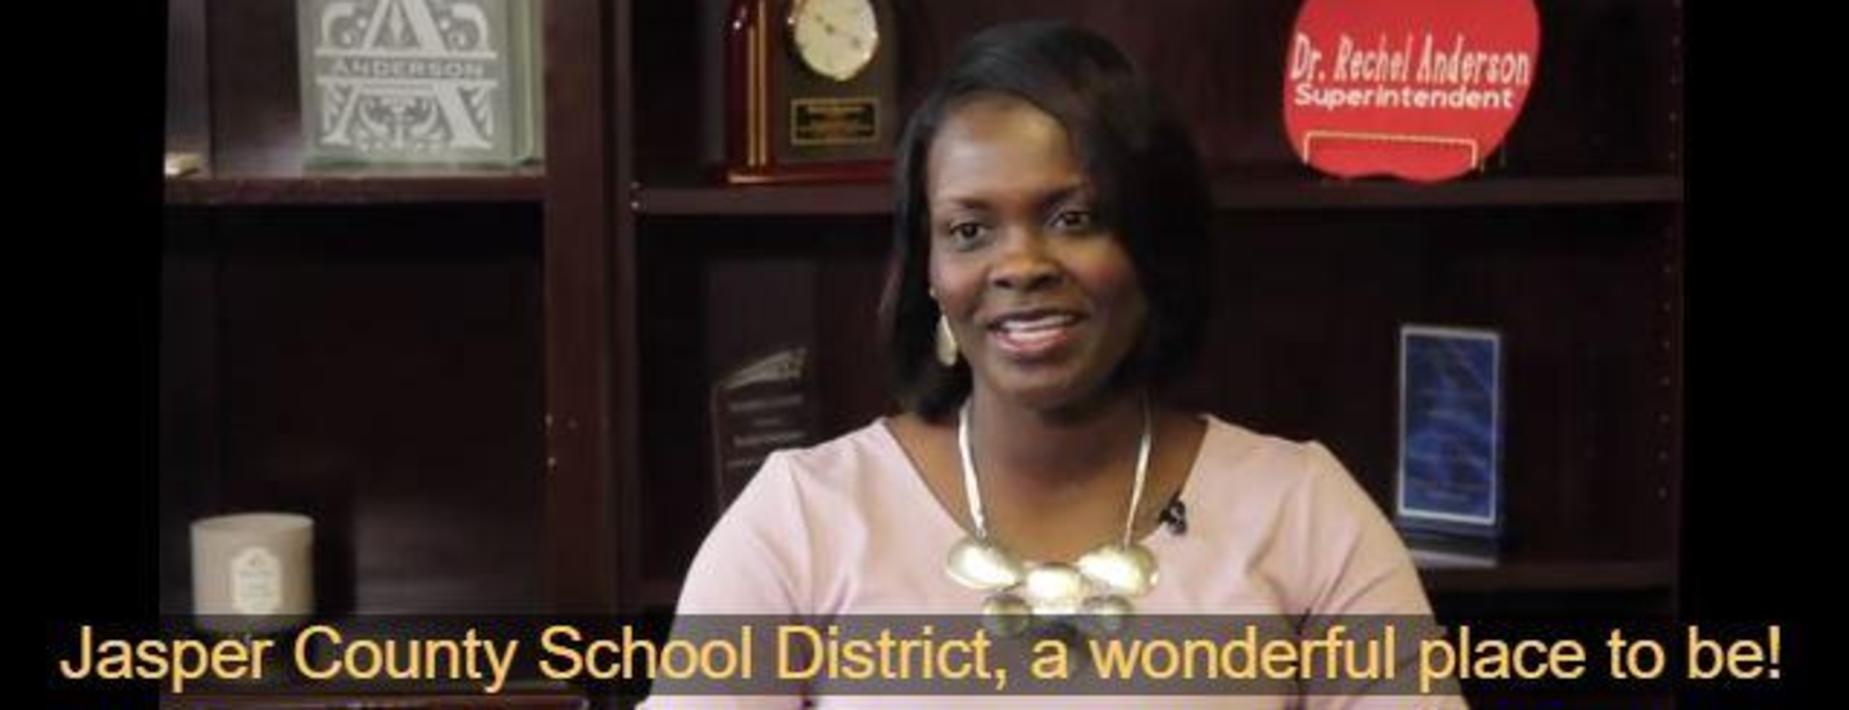 Jasper County School District Overview